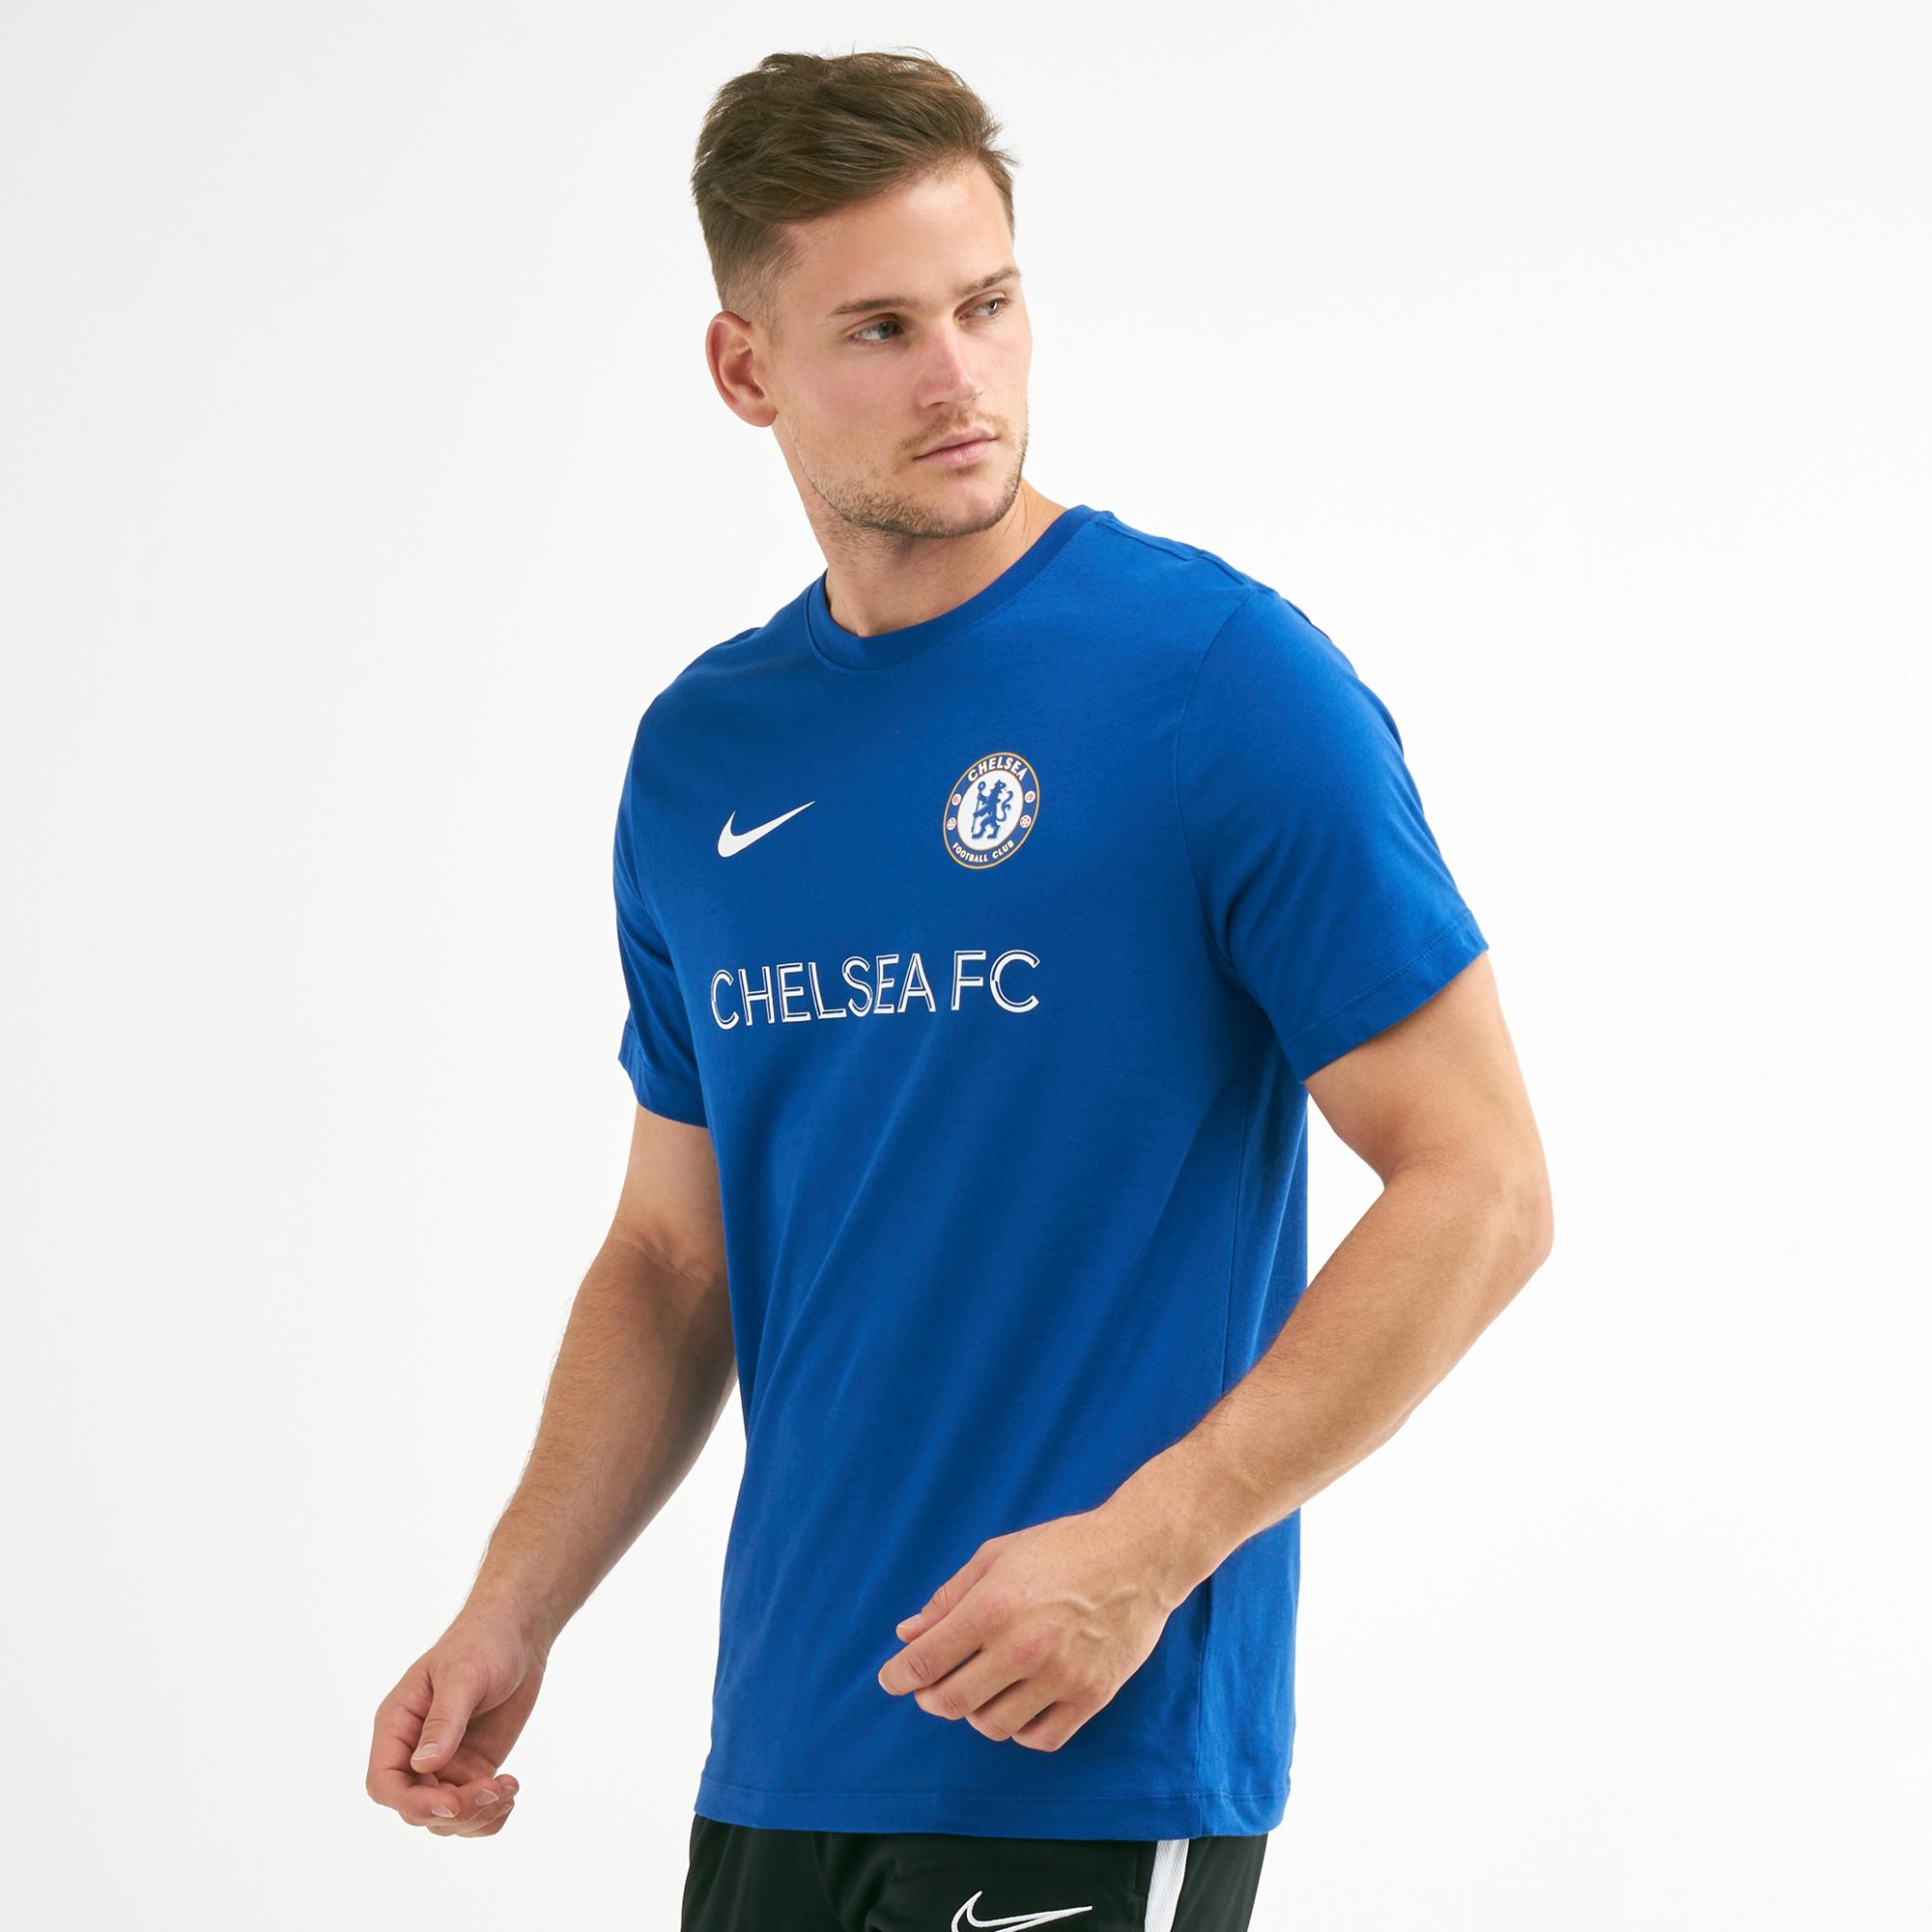 sale retailer 4eebf 4b75c Nike Men's Chelsea Football Club Core Match T-Shirt